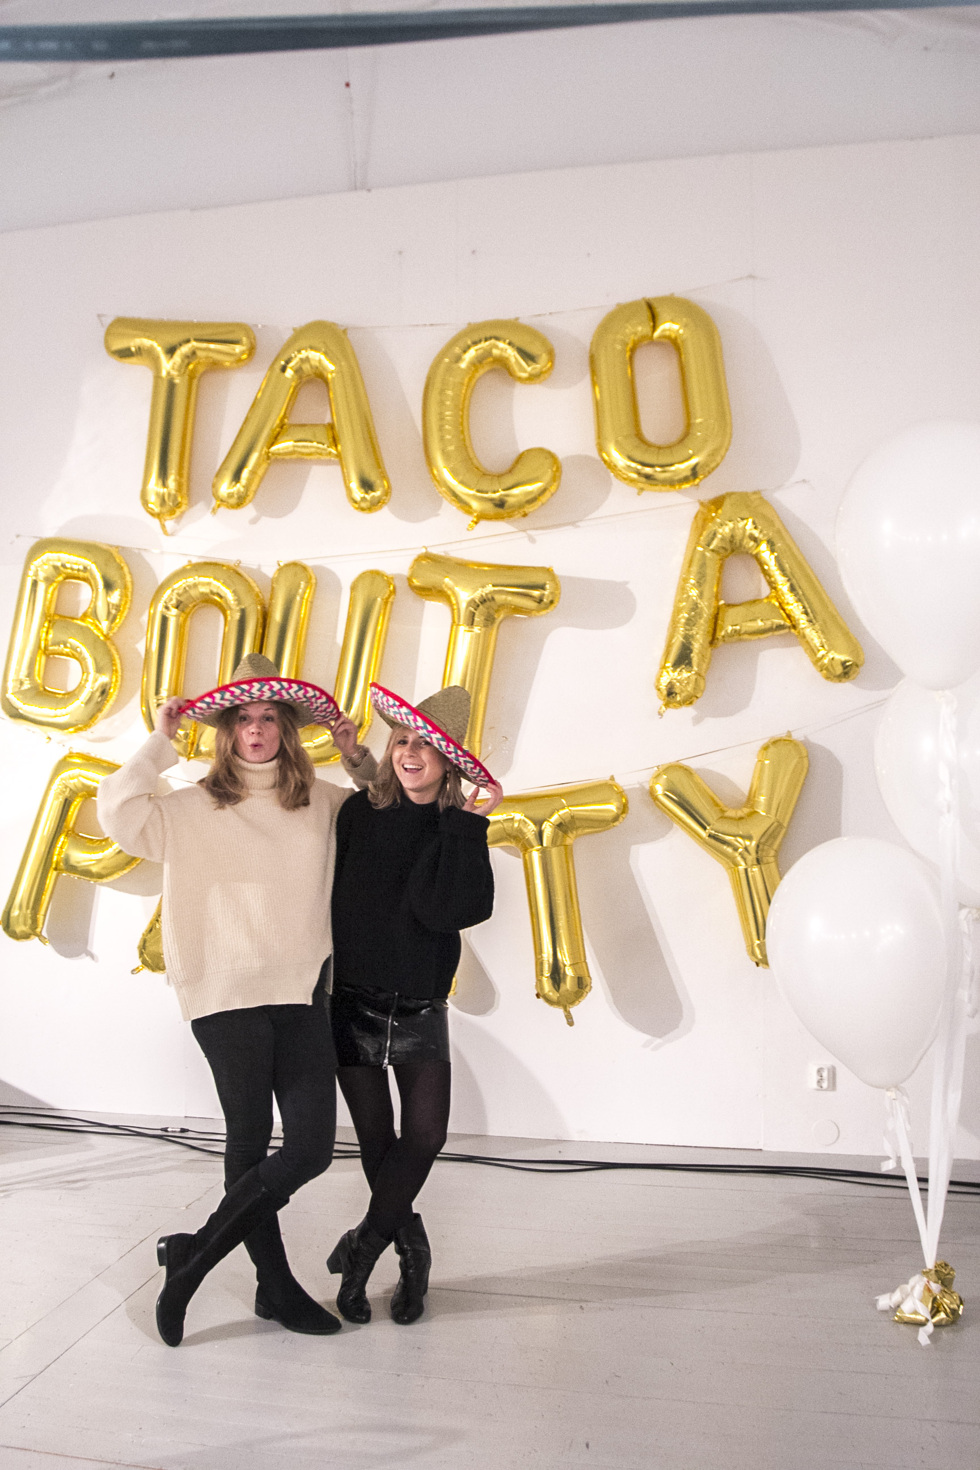 Henrietta_Fromholtz_Ica_Shake_That_Taco_51